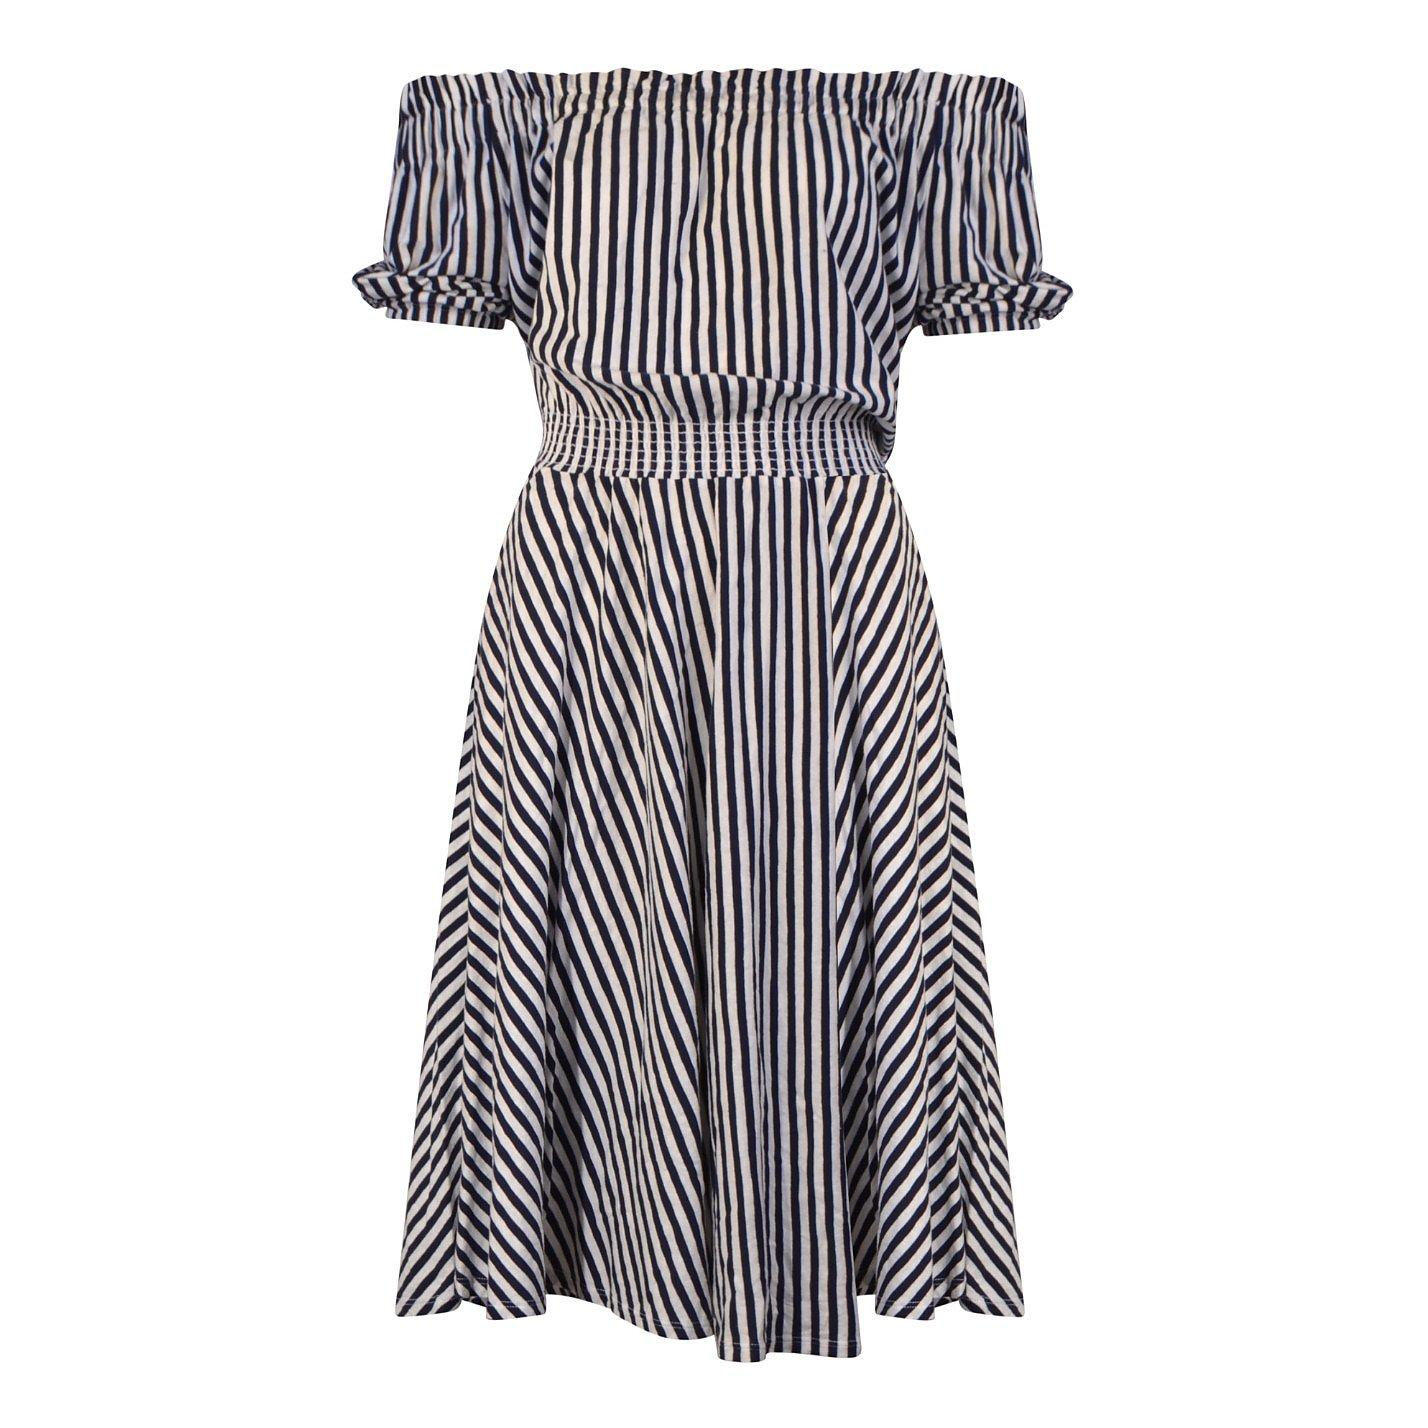 MDS Stripes Striped Cotton Dress